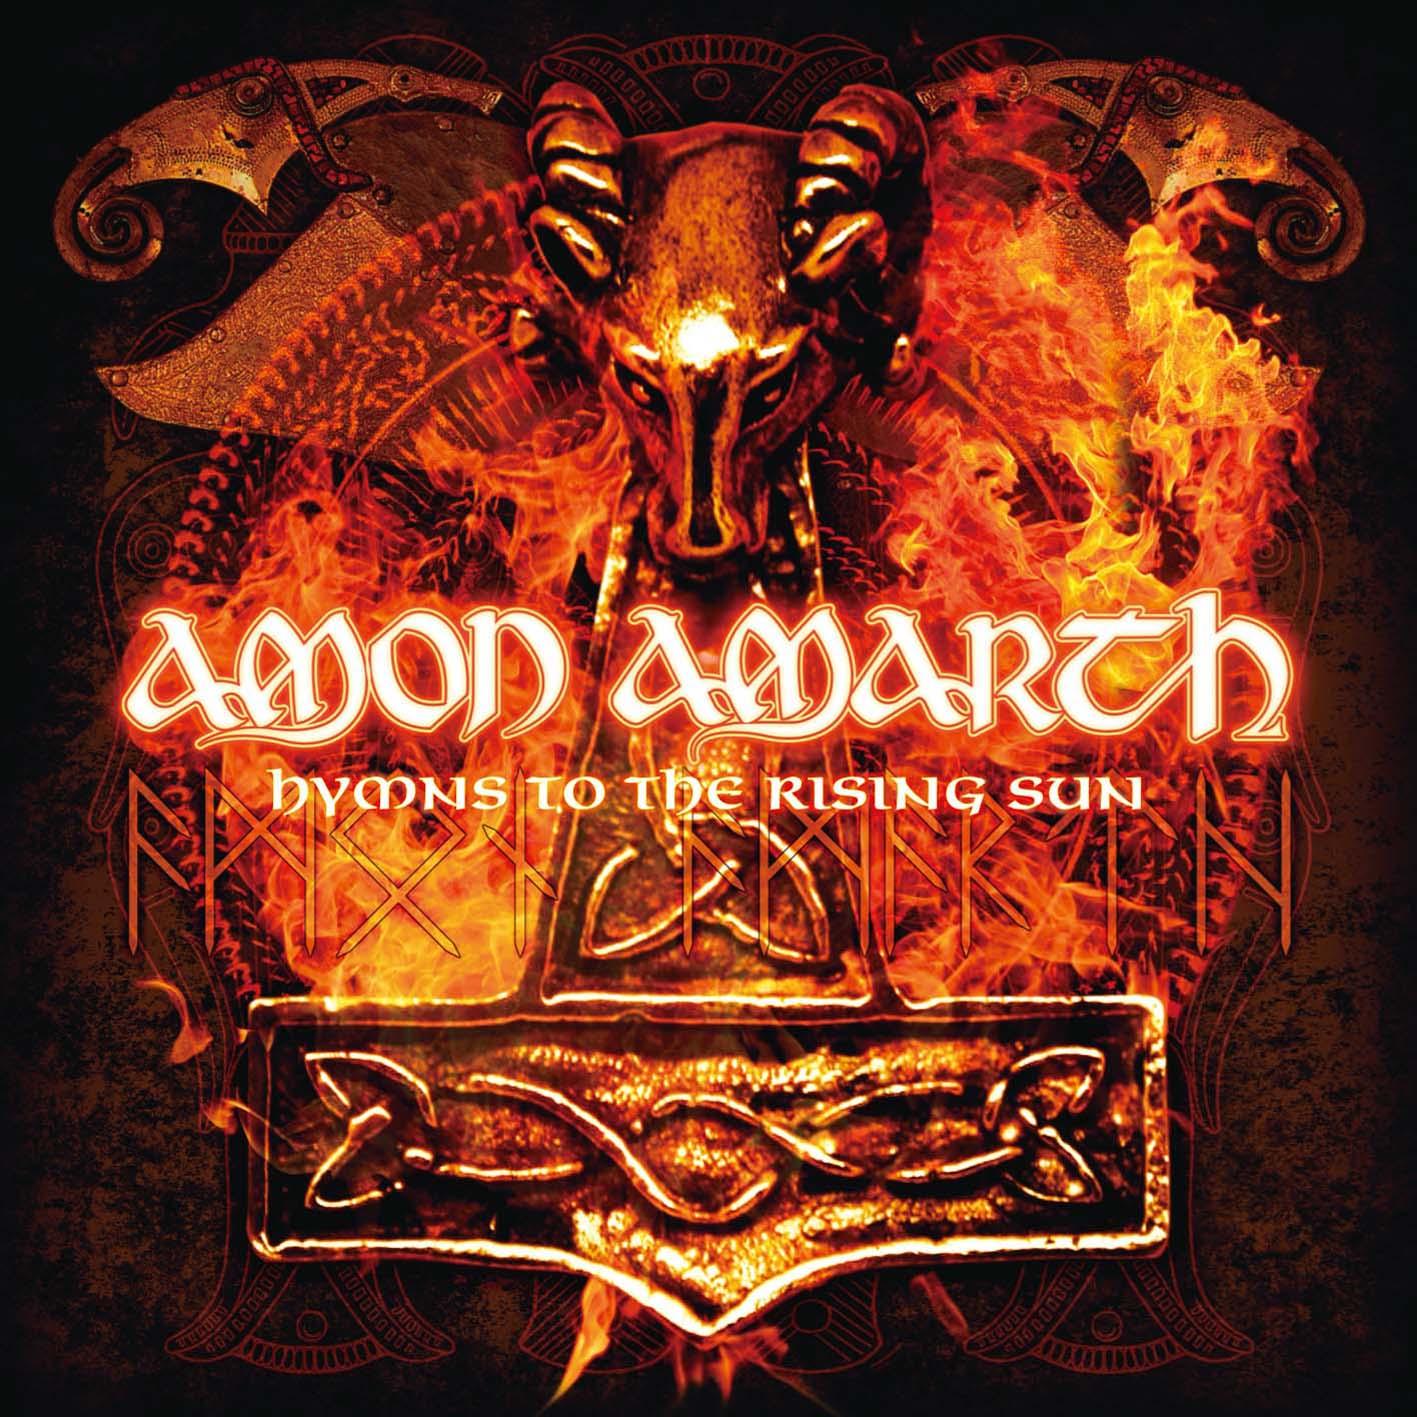 Various - Progressive Rock & Metal Compilation 2003